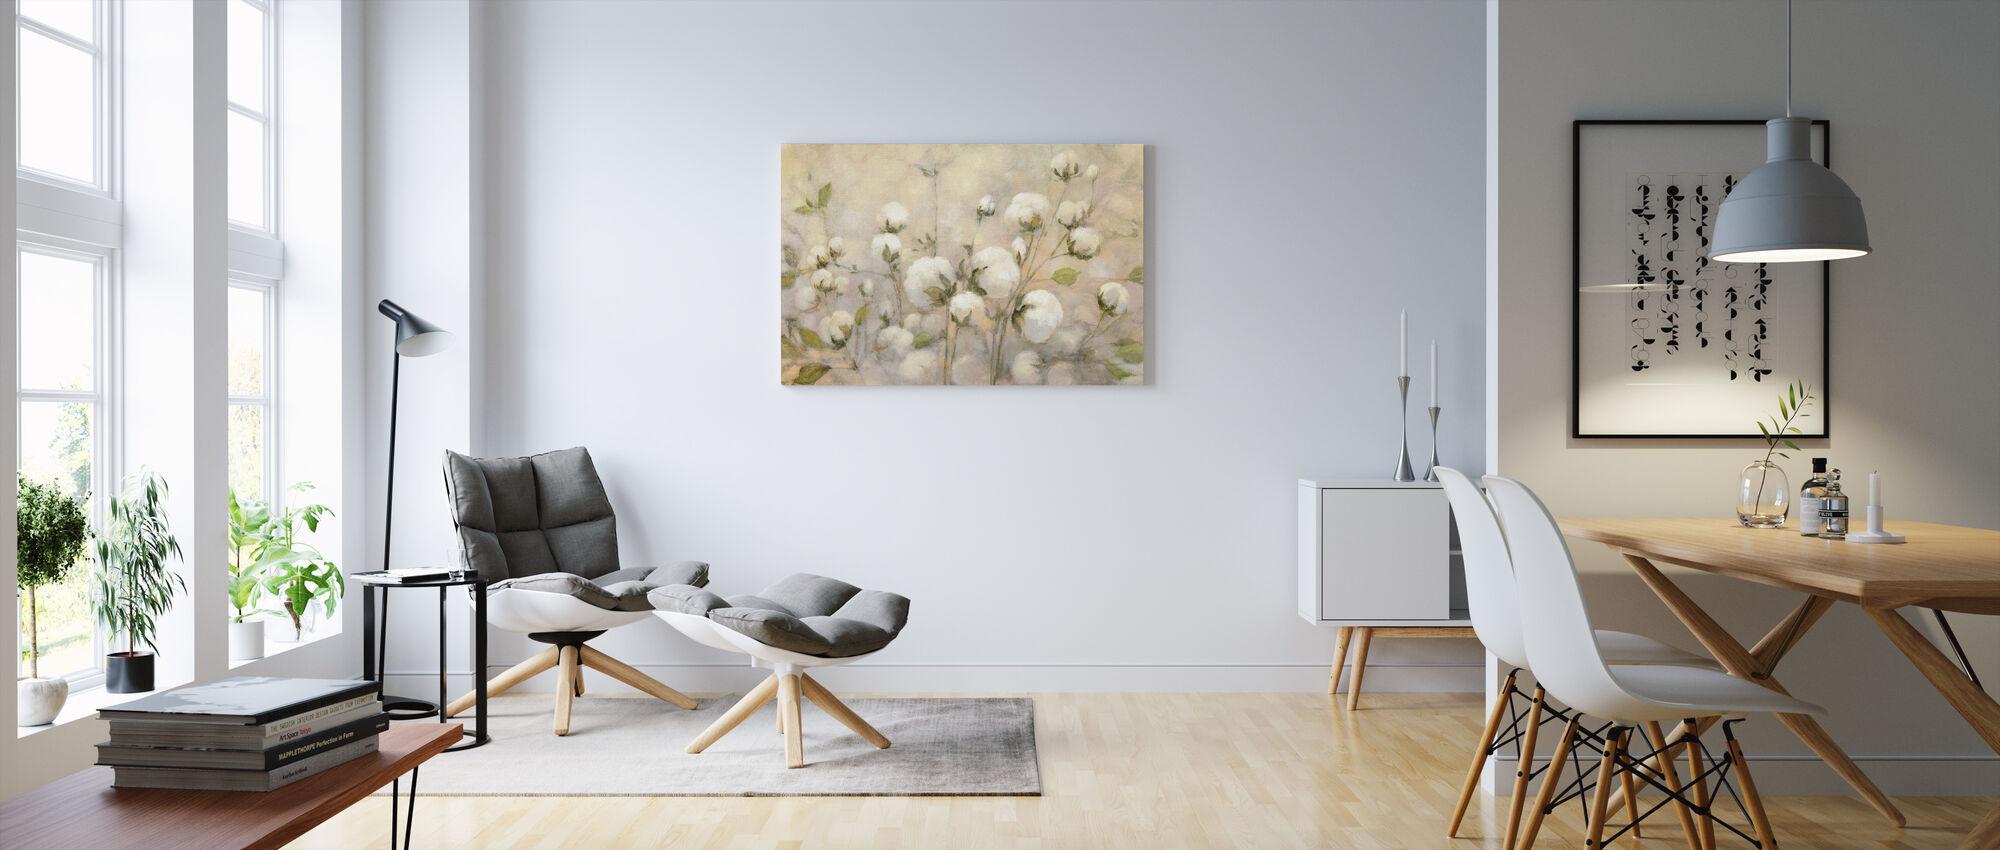 Cotton Field - Canvas print - Living Room